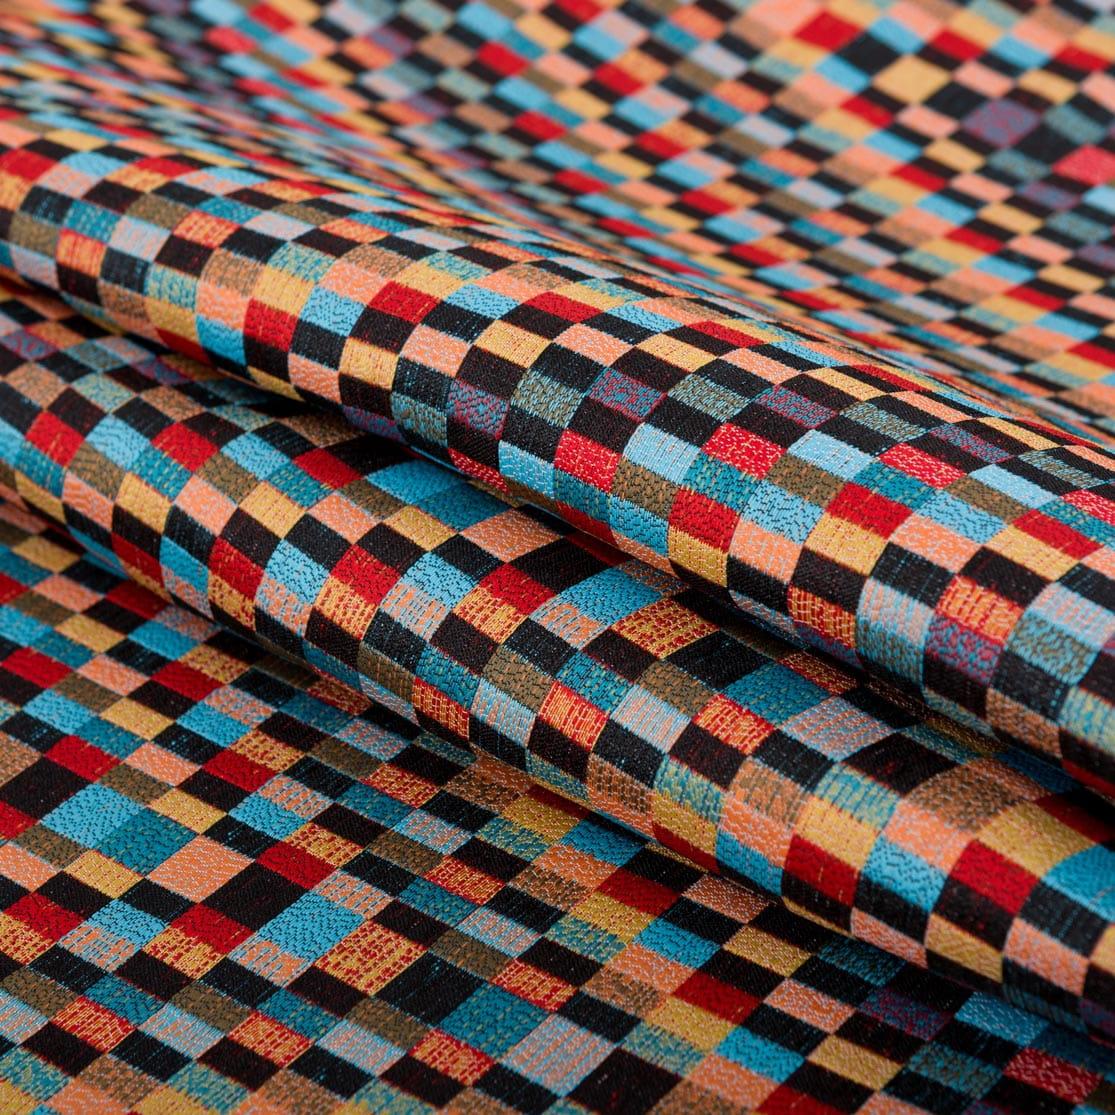 eff49a314702e3 Barcelona - Tkanina obiciowa 0,5mb ARM - Tkaniny Meblowe - Sklep ...